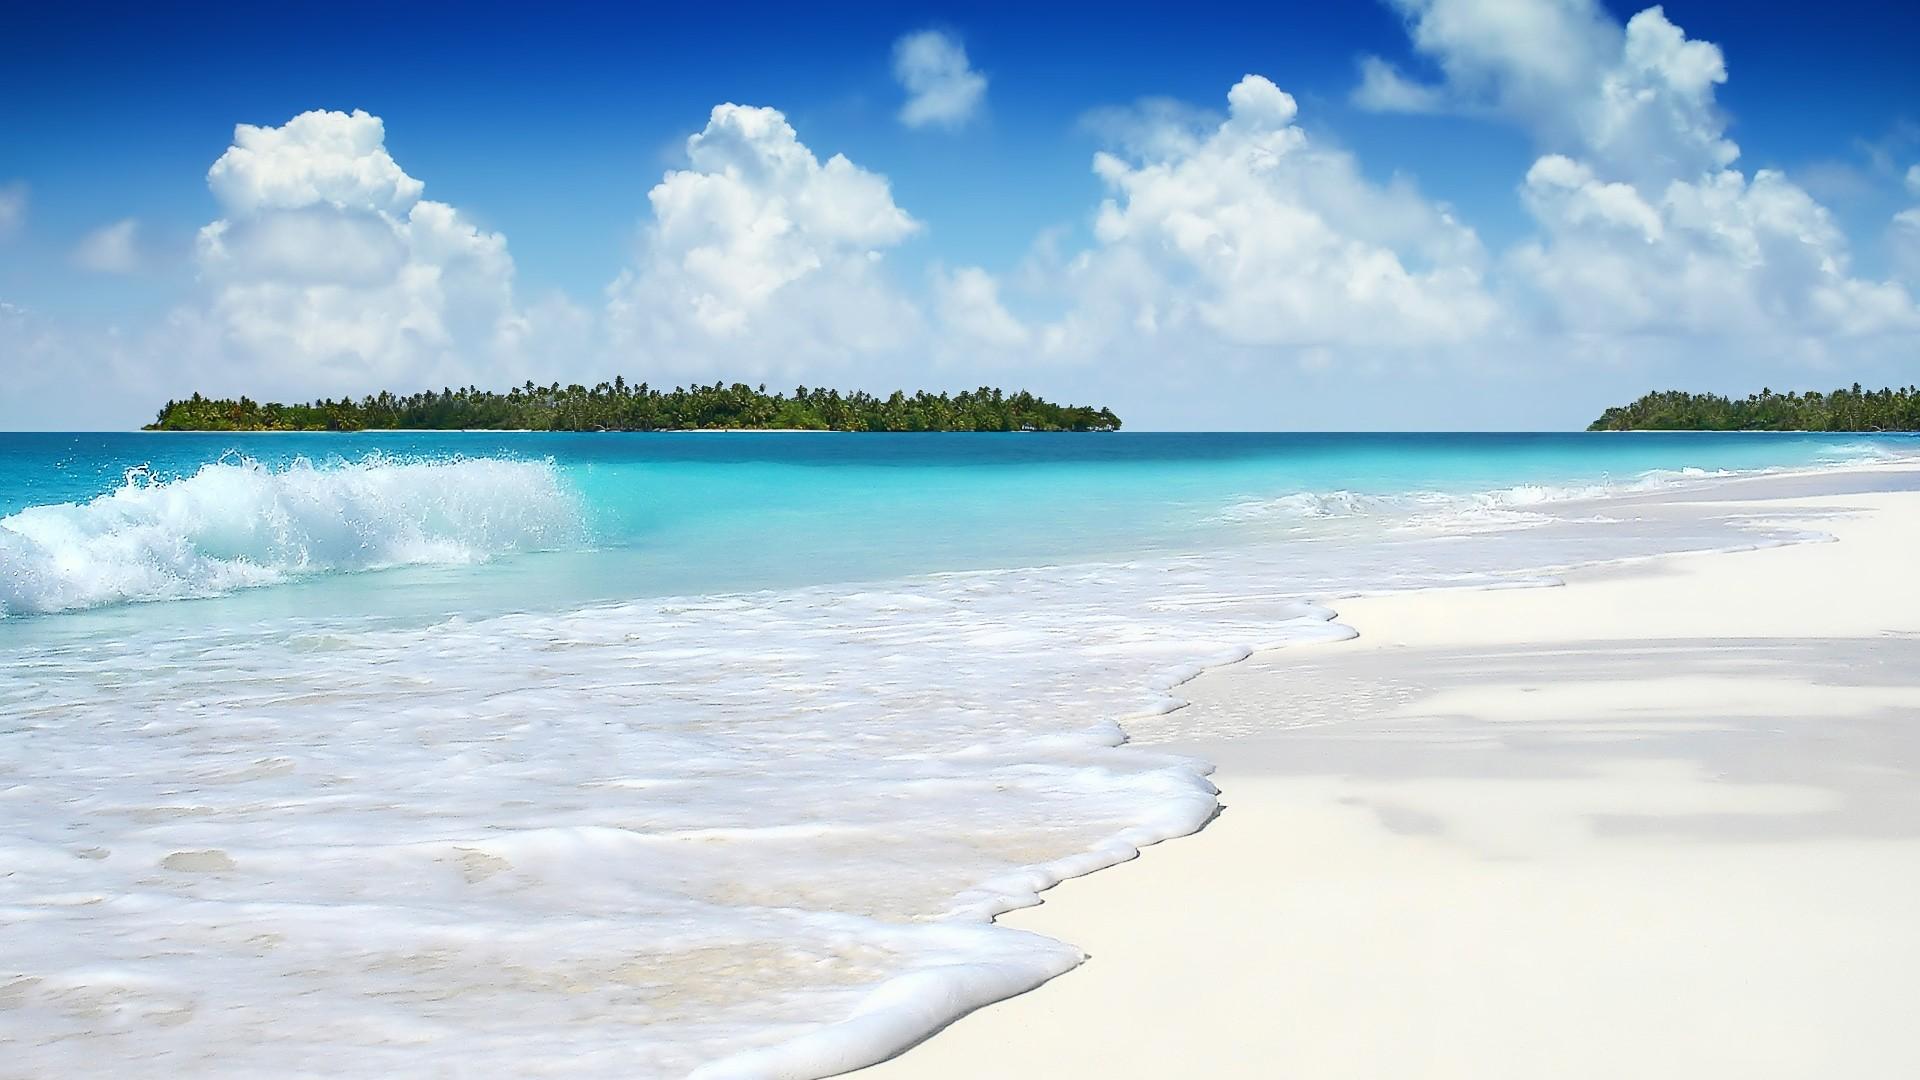 plage de sable blanc fond d 39 cran hd 10 000 fonds d 39 cran hd gratuits et de qualit. Black Bedroom Furniture Sets. Home Design Ideas